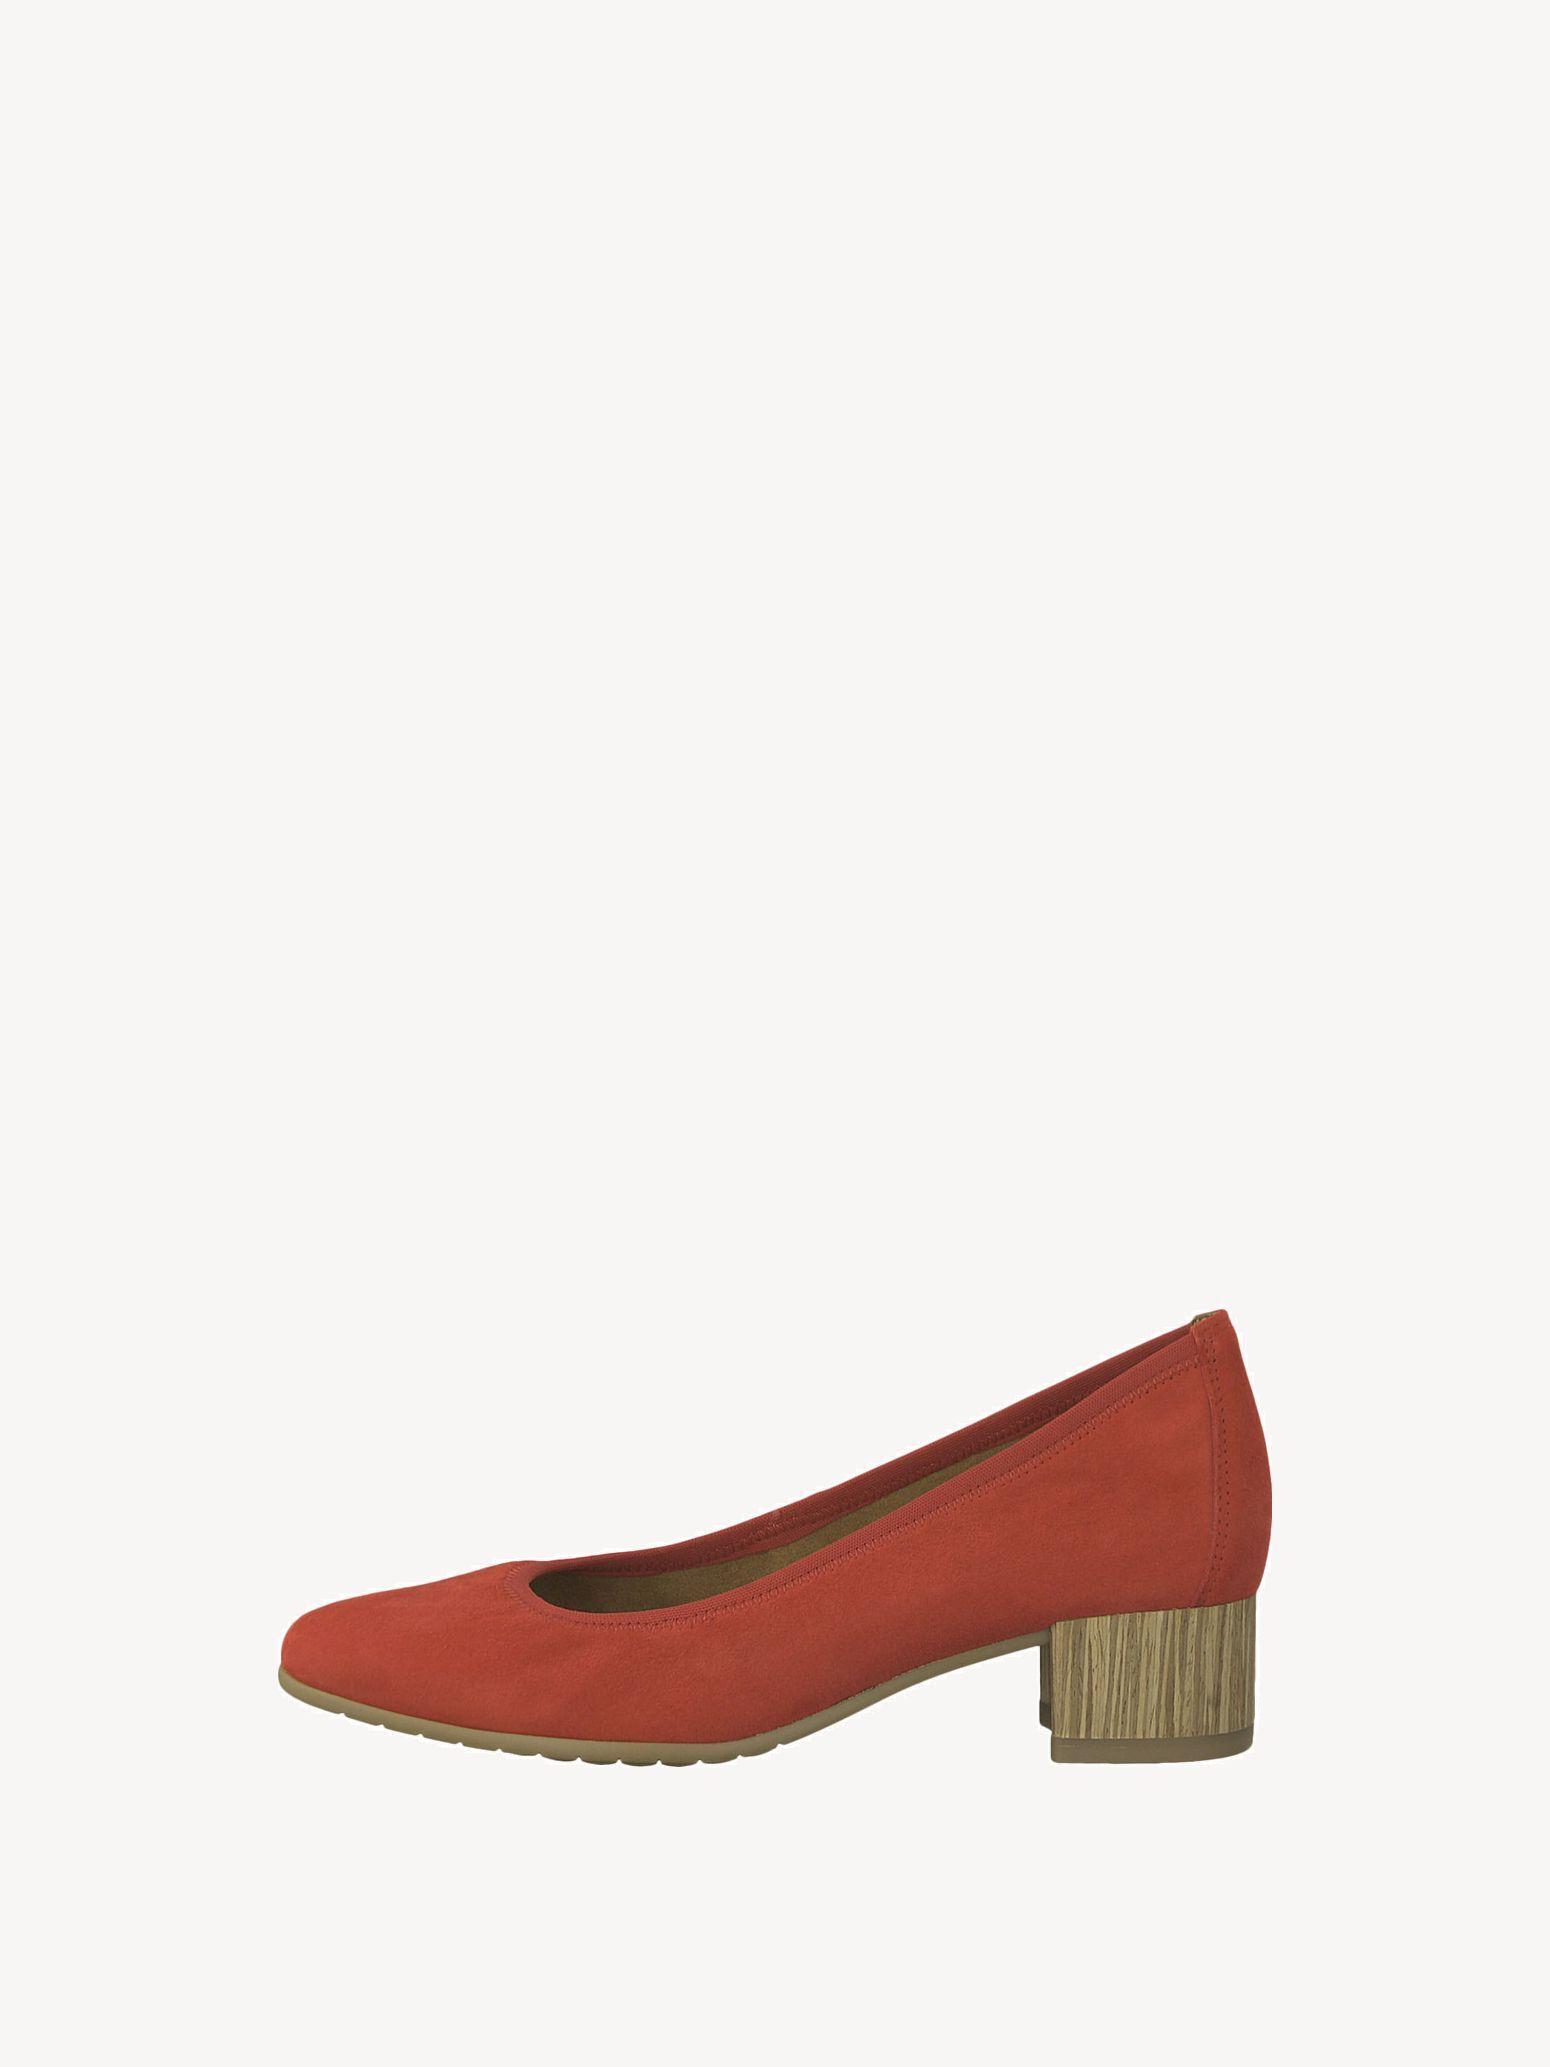 Jetzt Schönsten Tamaris Damen Schuhe Sneaker Online